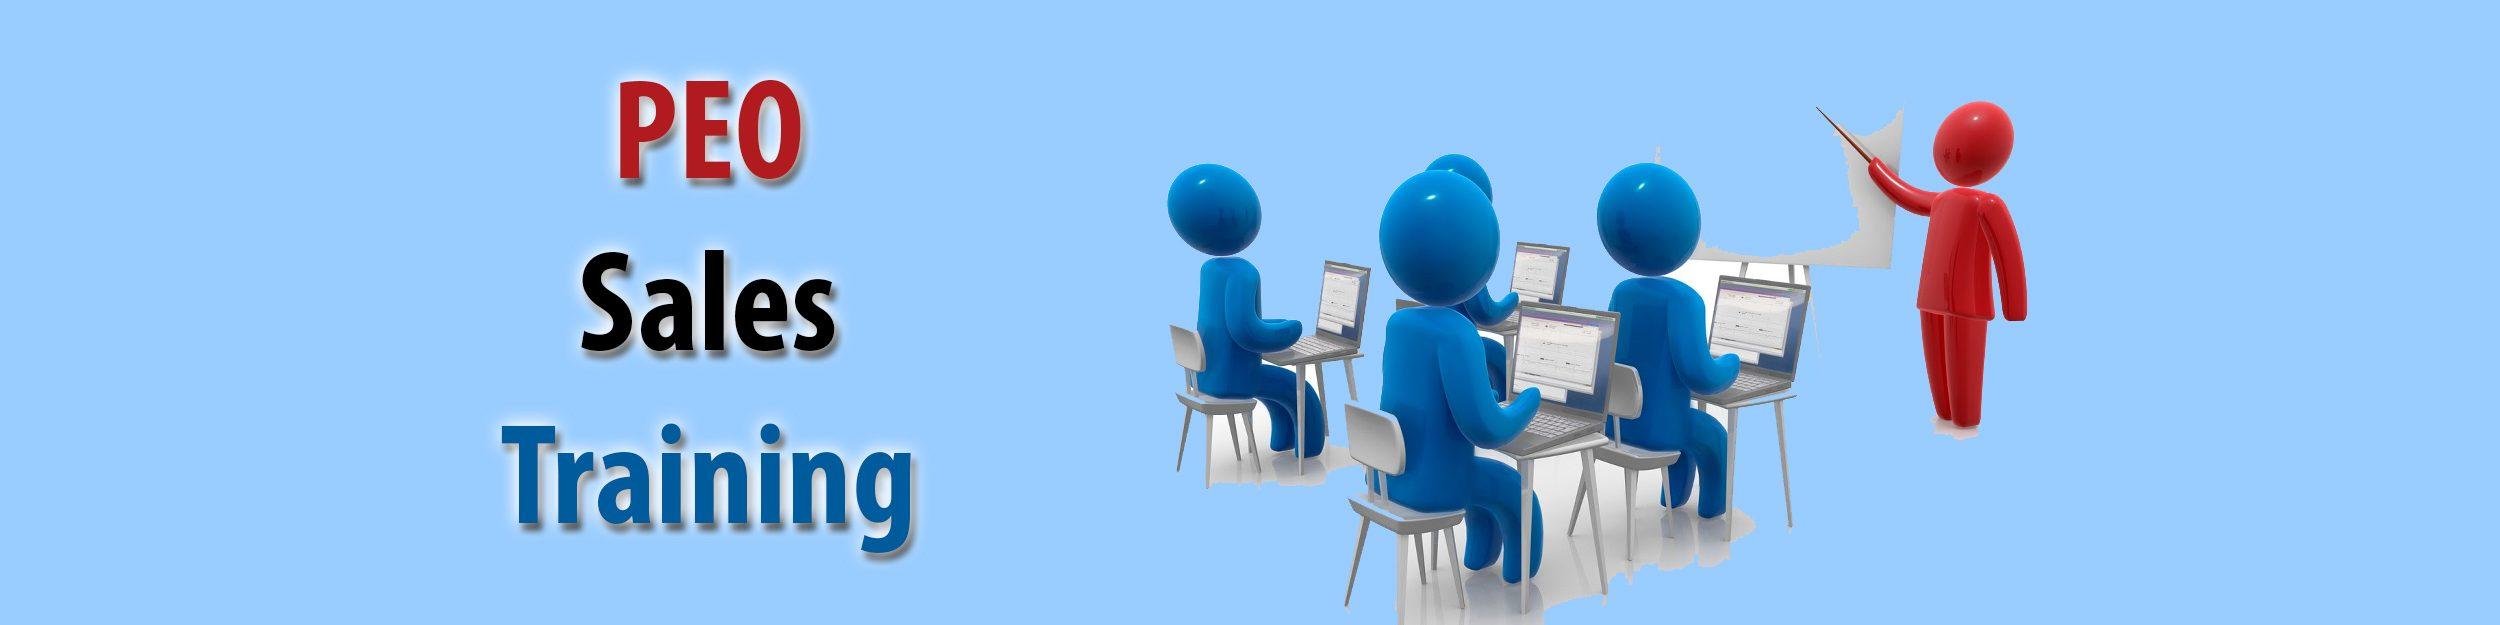 PEO Sales Training